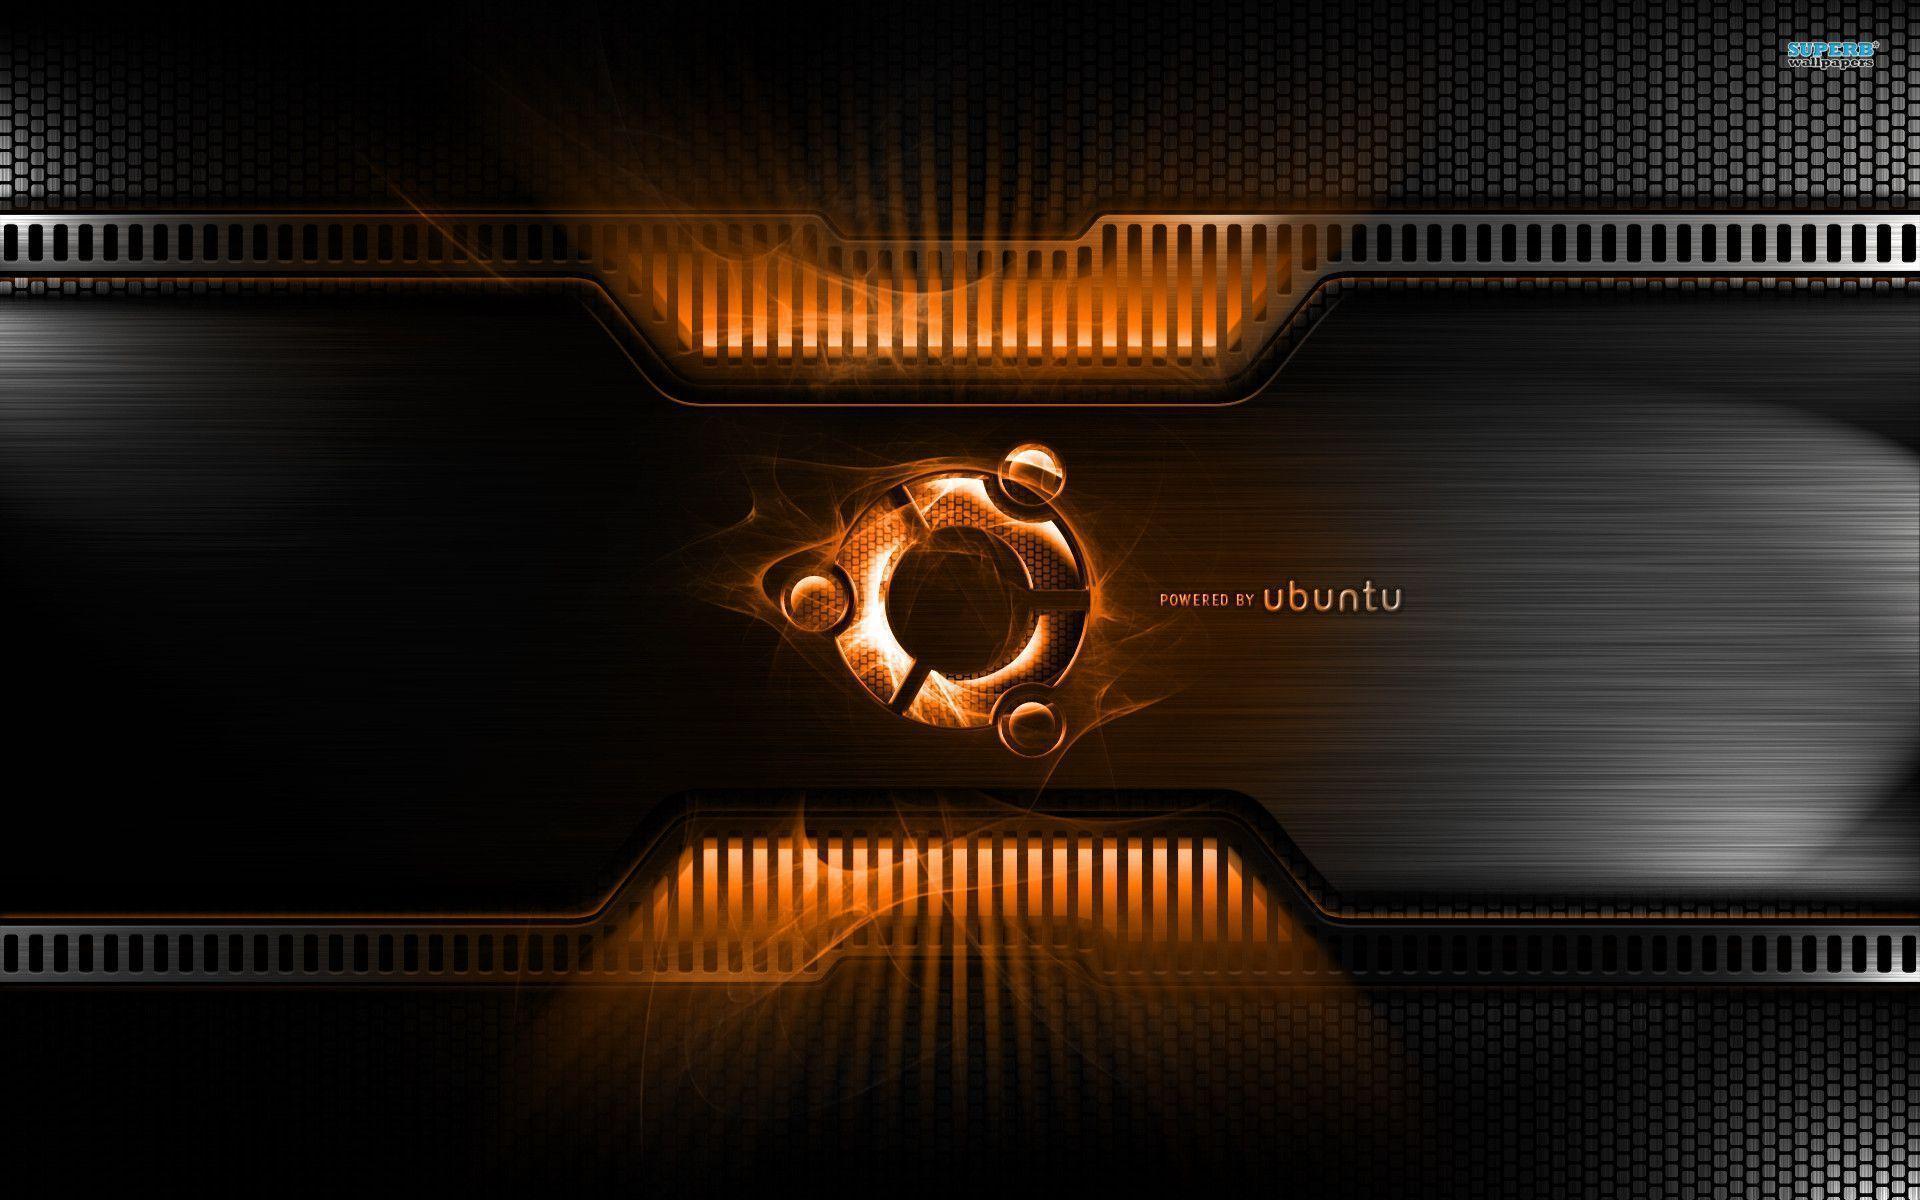 Ubuntu Desktop Backgrounds Wallpaper Cave